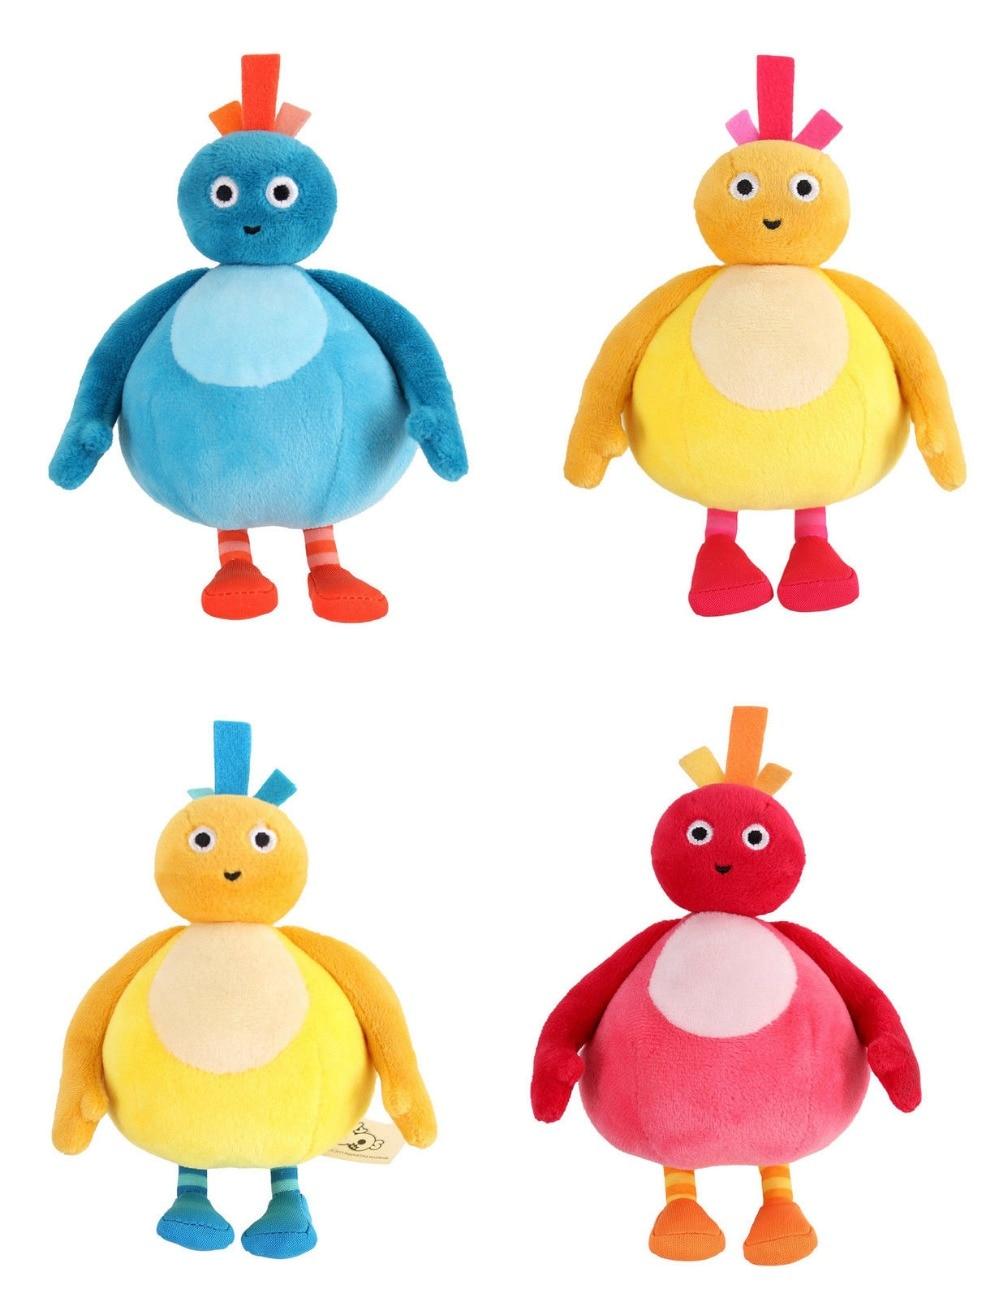 New Twirlywoos Plush Soft Toy Chick Toodloo Great Big Hoo Chickedy Peekaboo Set of 5 Car phone